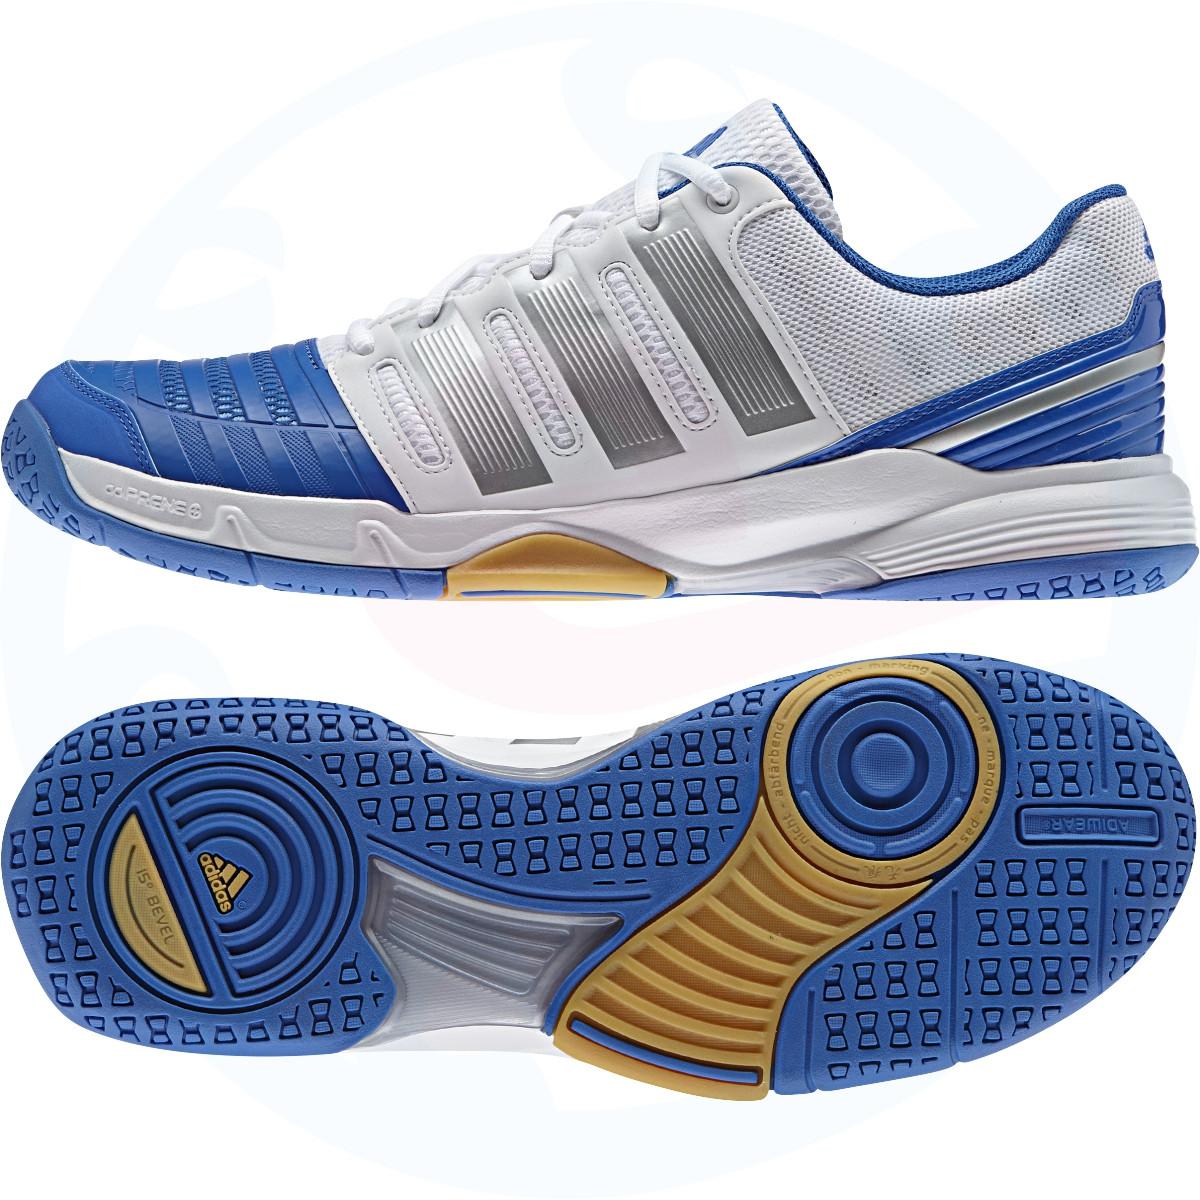 Adidas Hallenschuhe Performance stabil `15 court 11 CxhQrtds